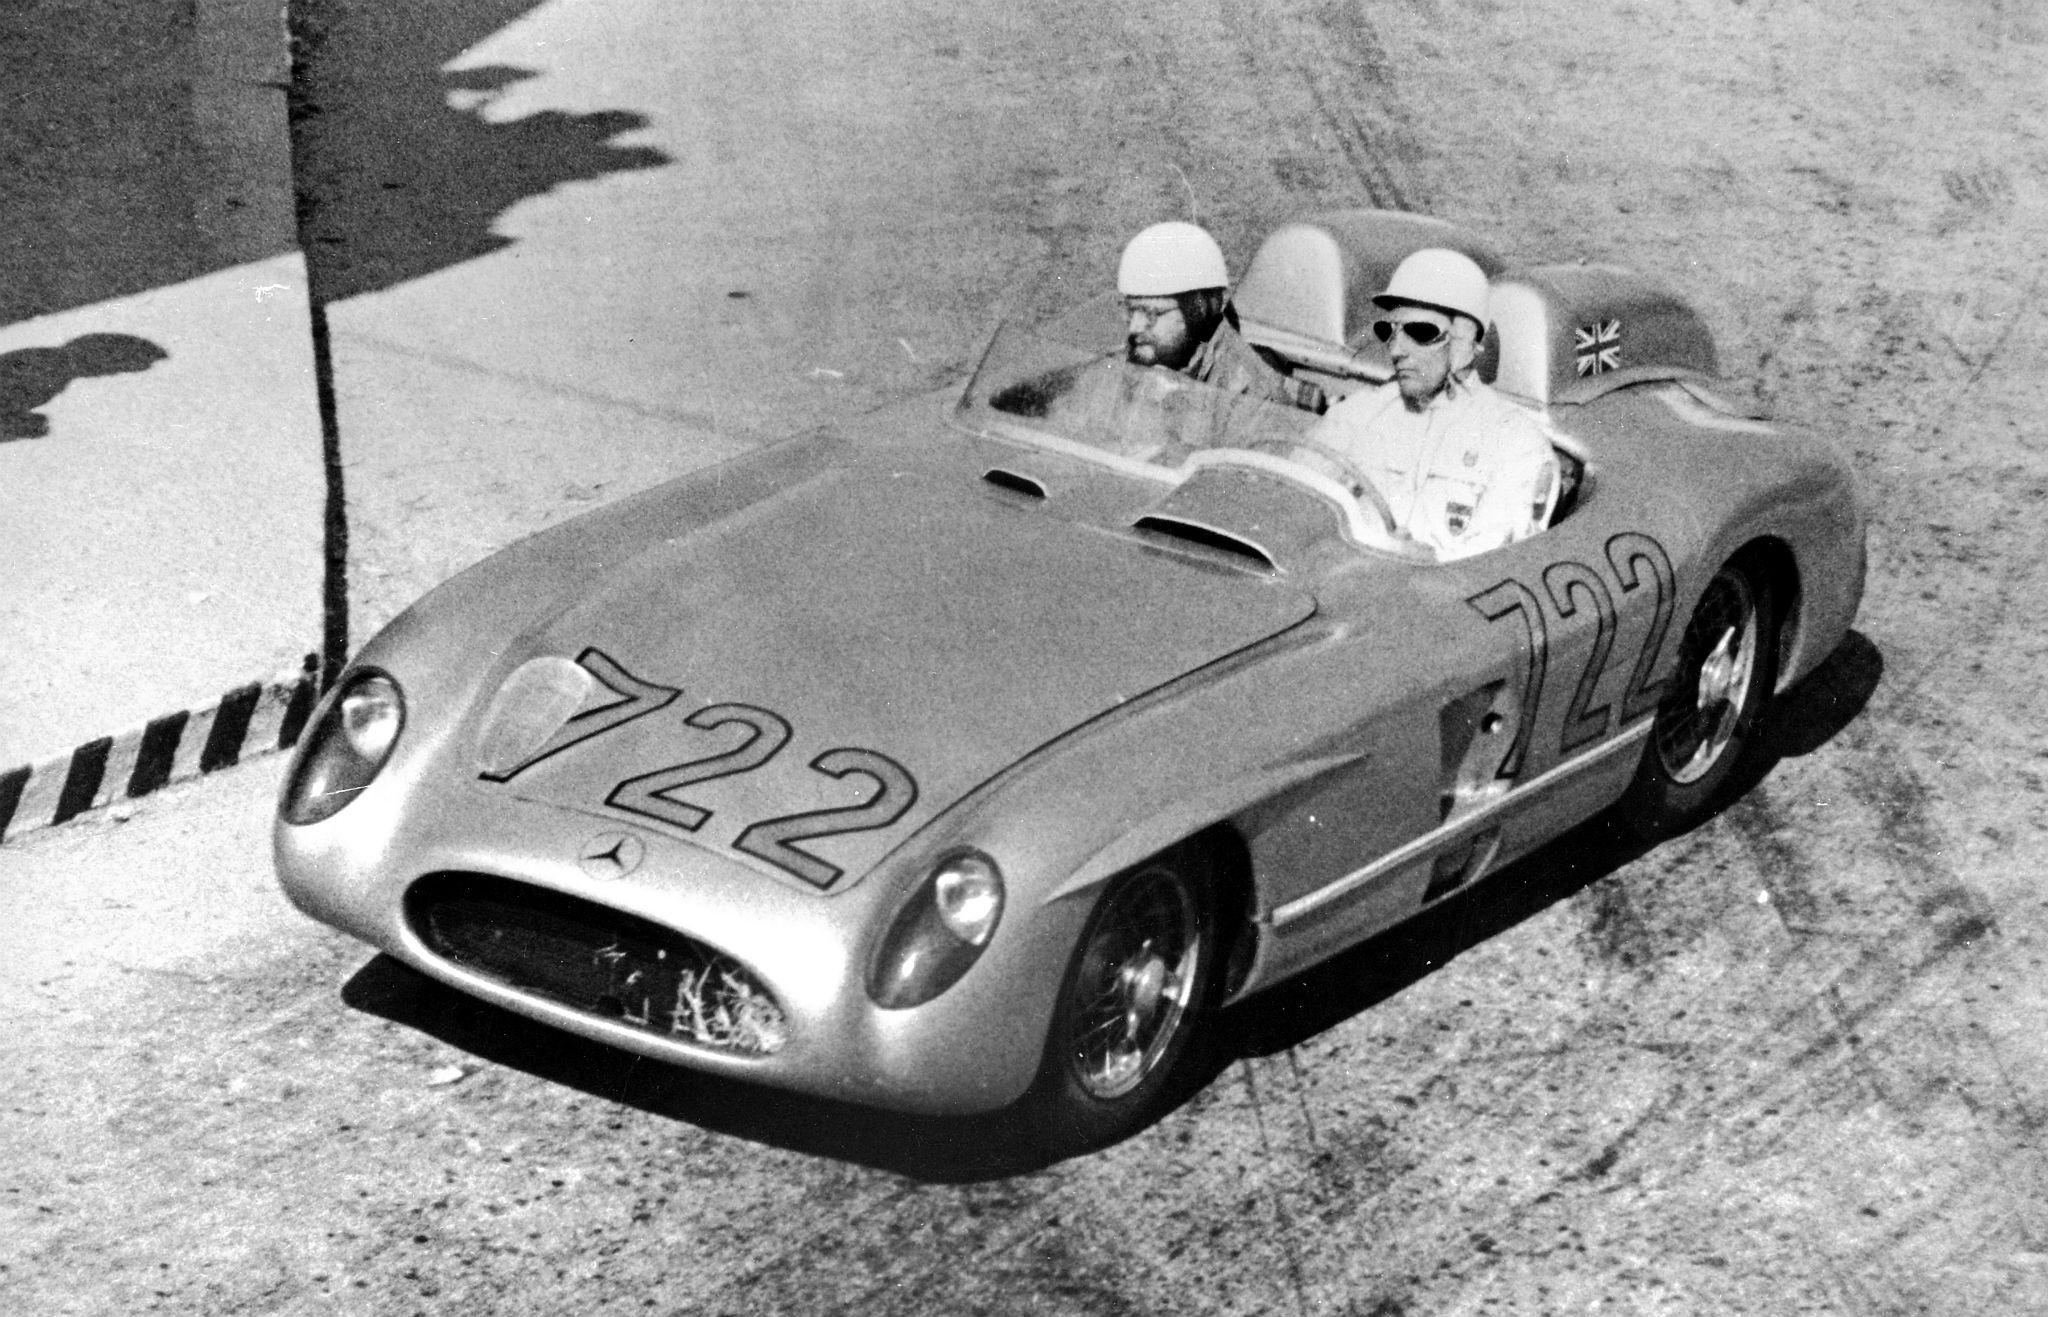 1955 Mercedes-Benz SLR - Stirling Moss - Mille Miglia